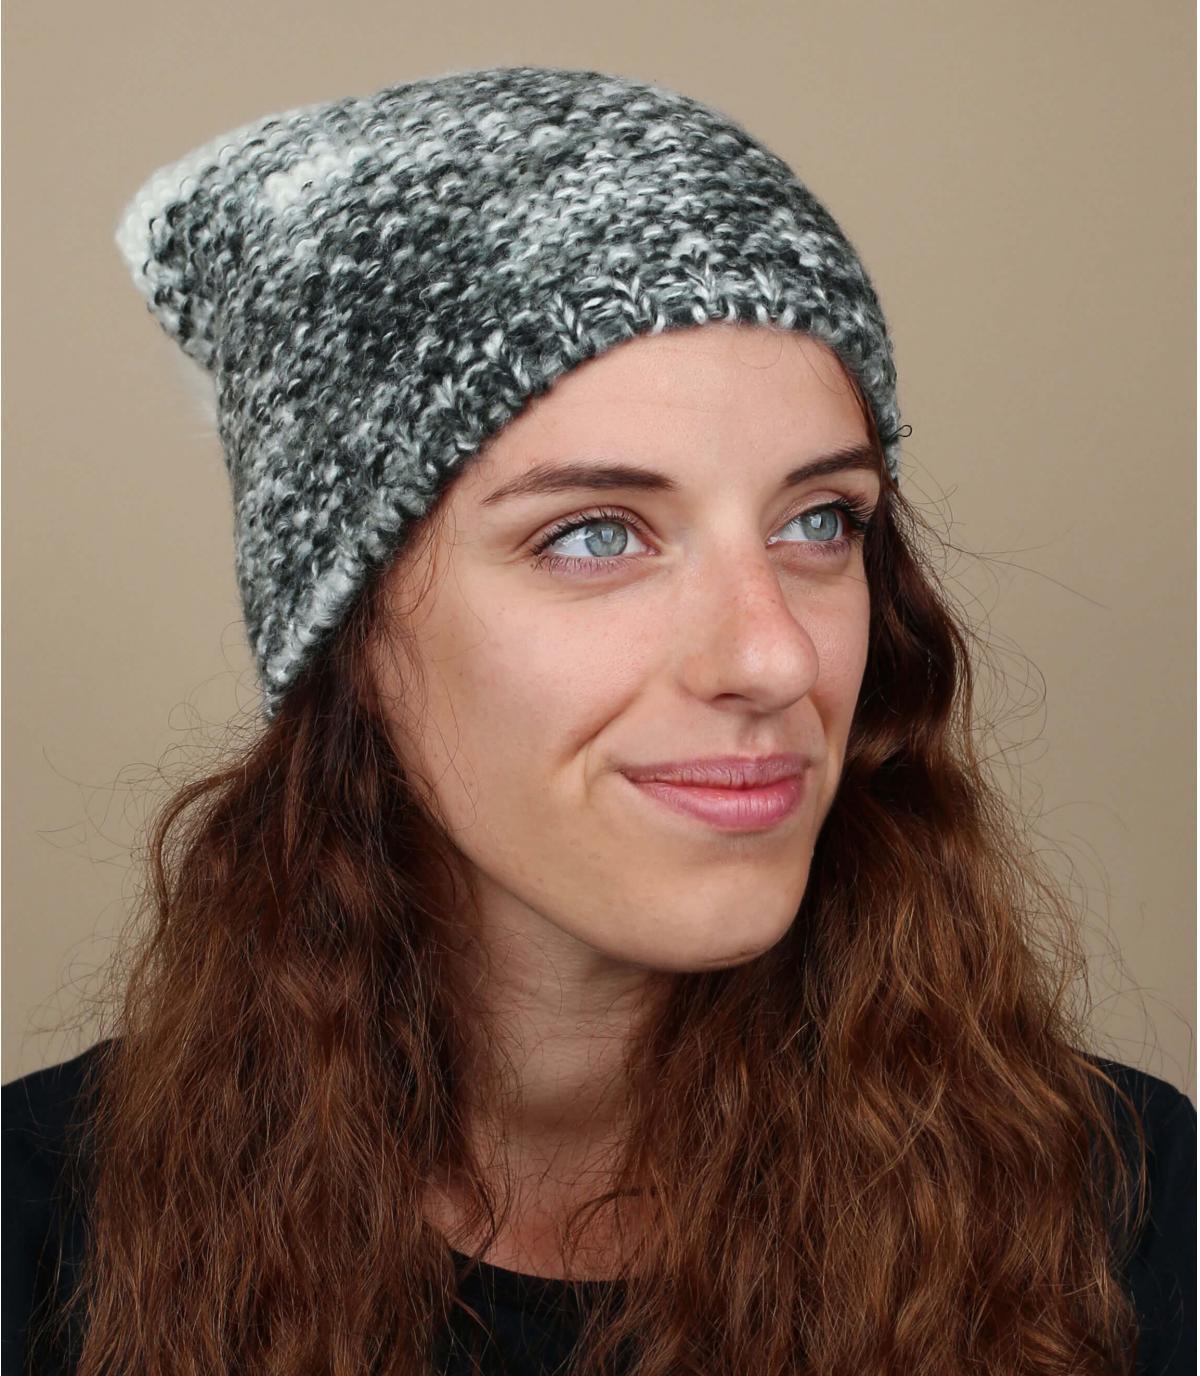 two-tone grijze kwastje cap